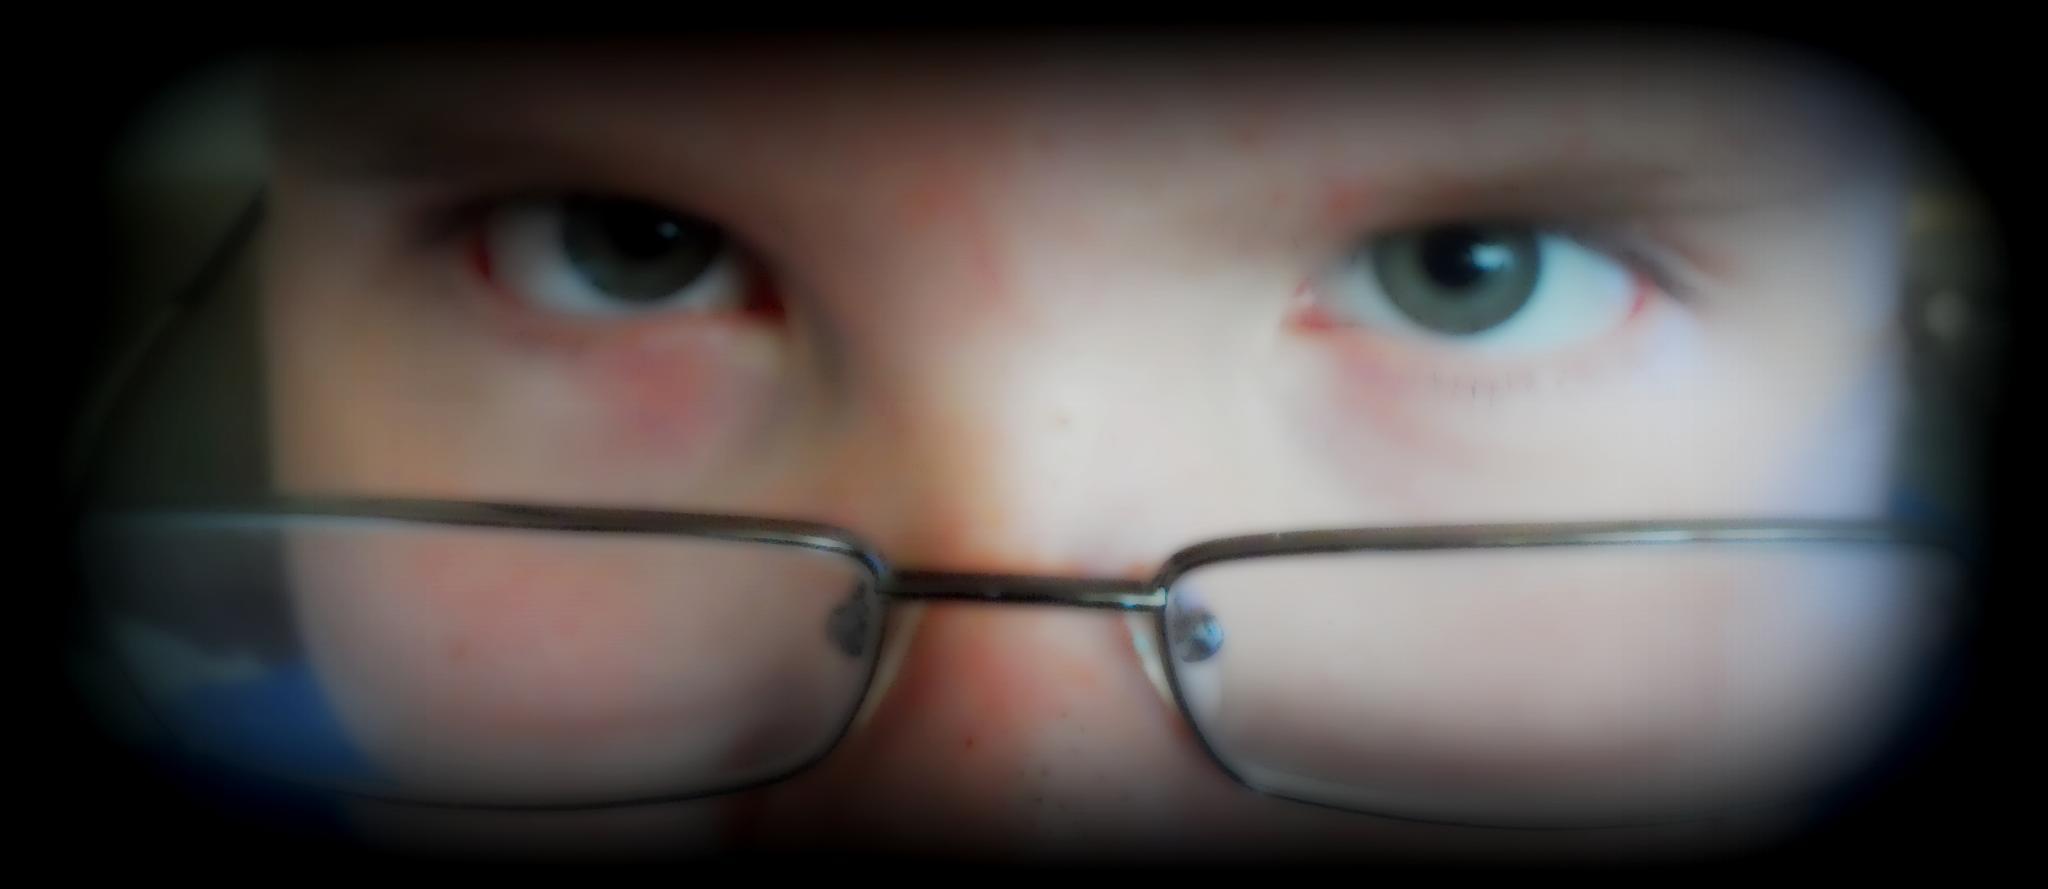 I See You by hardworkinmom